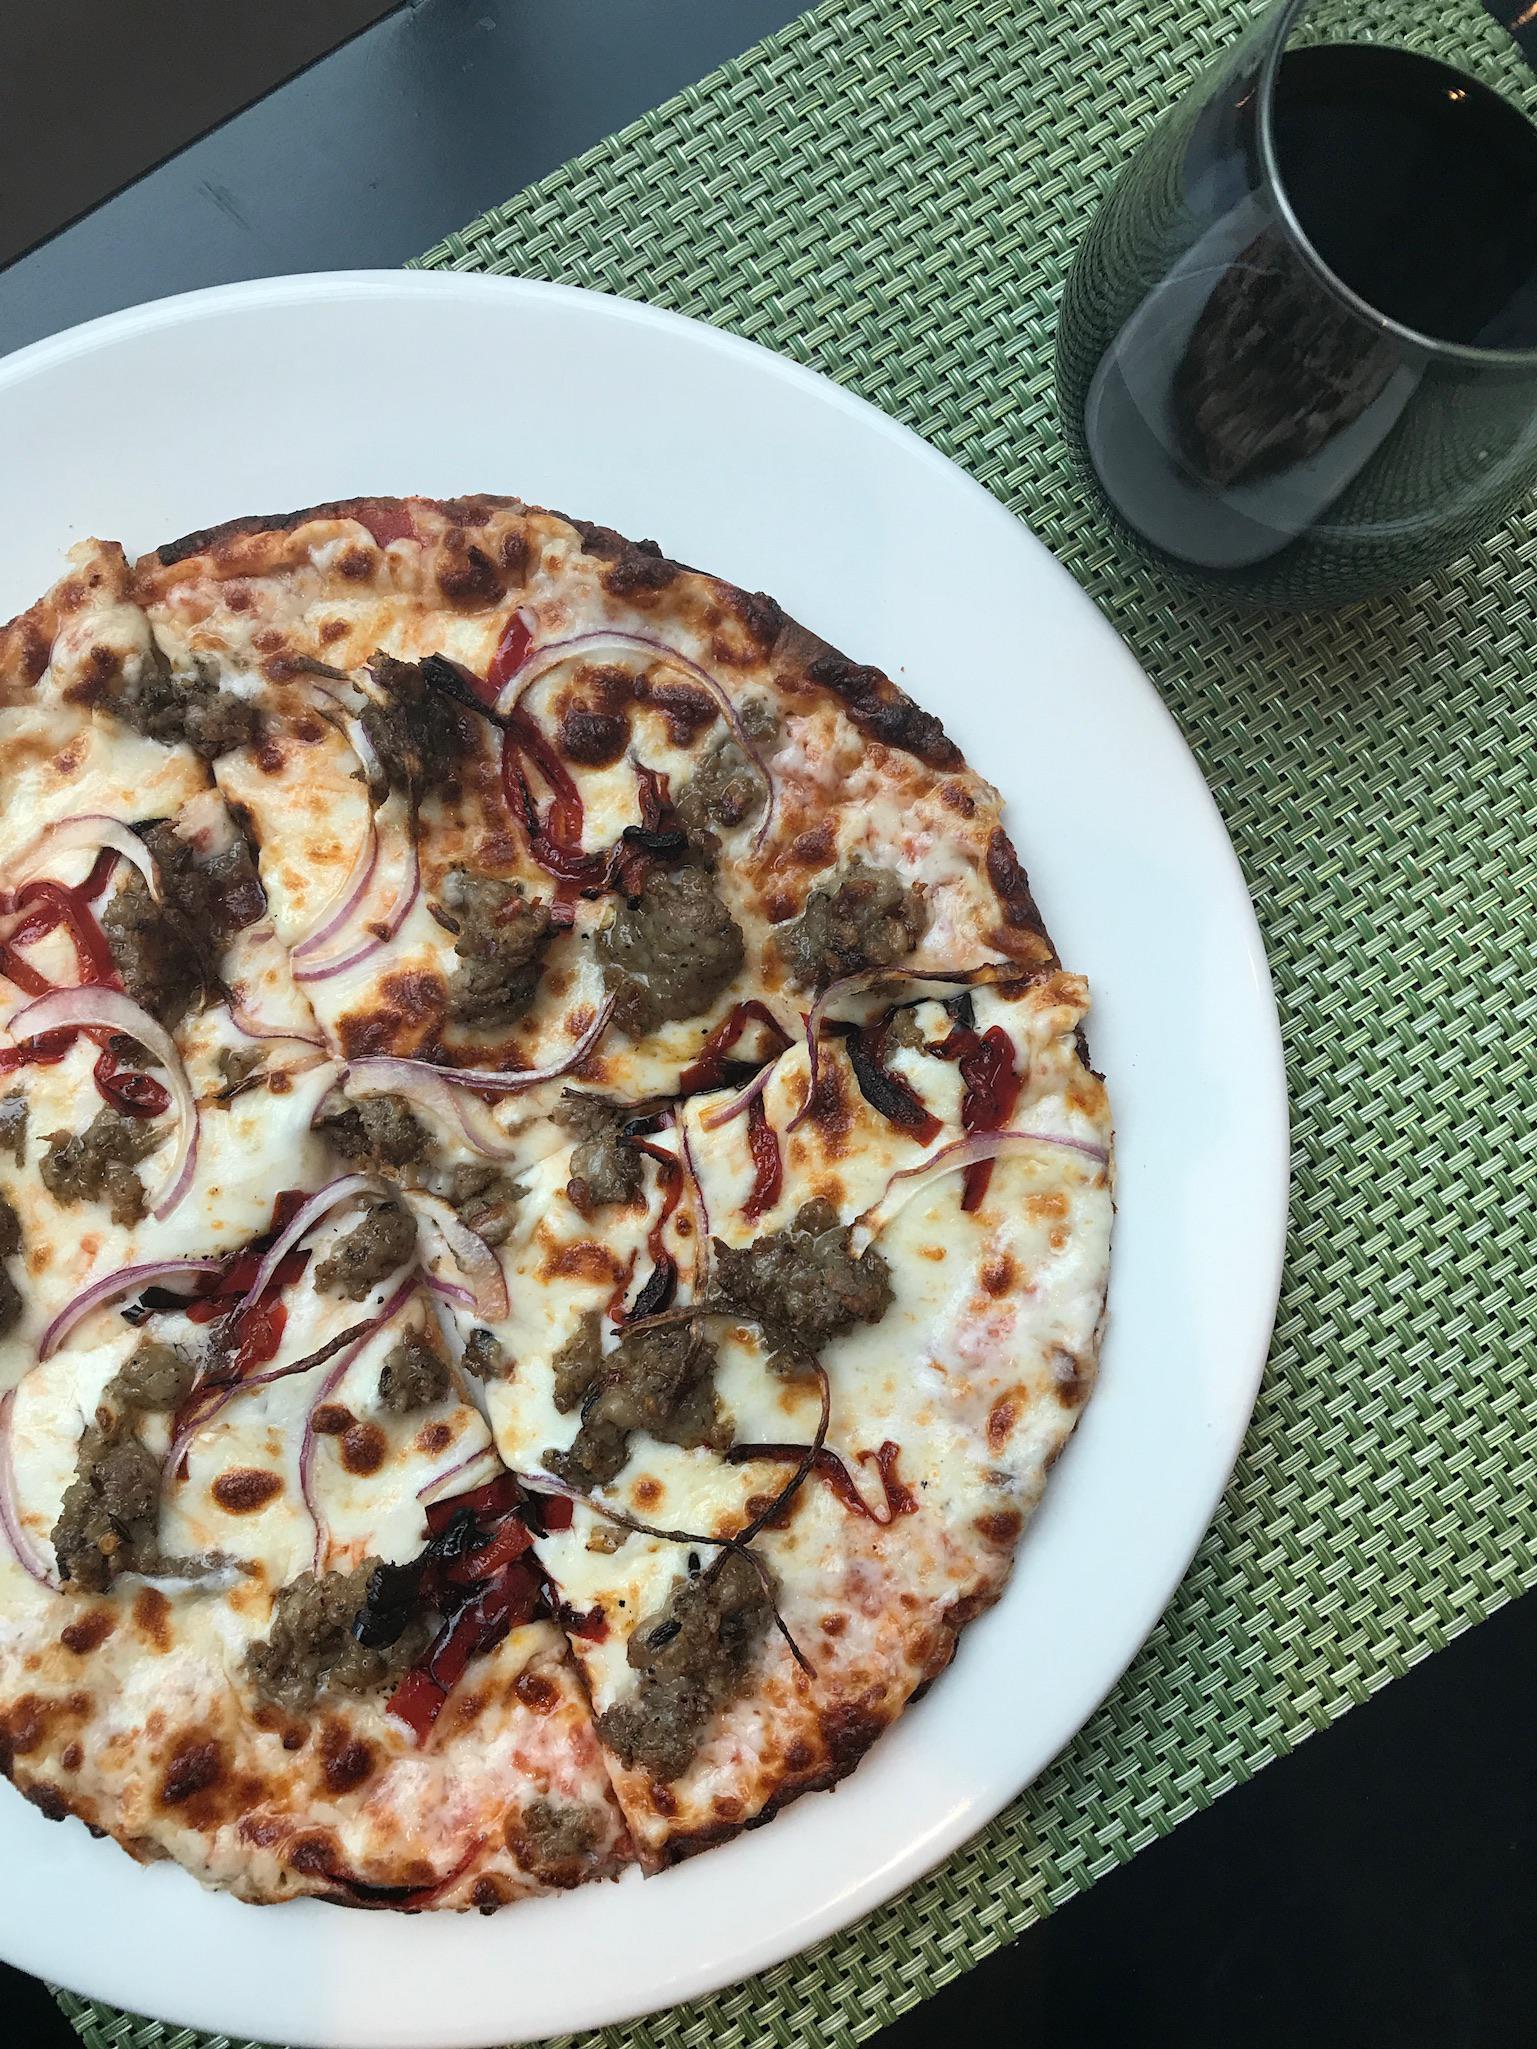 Creole Country Italian Sausage Flatbread Pizza Photo